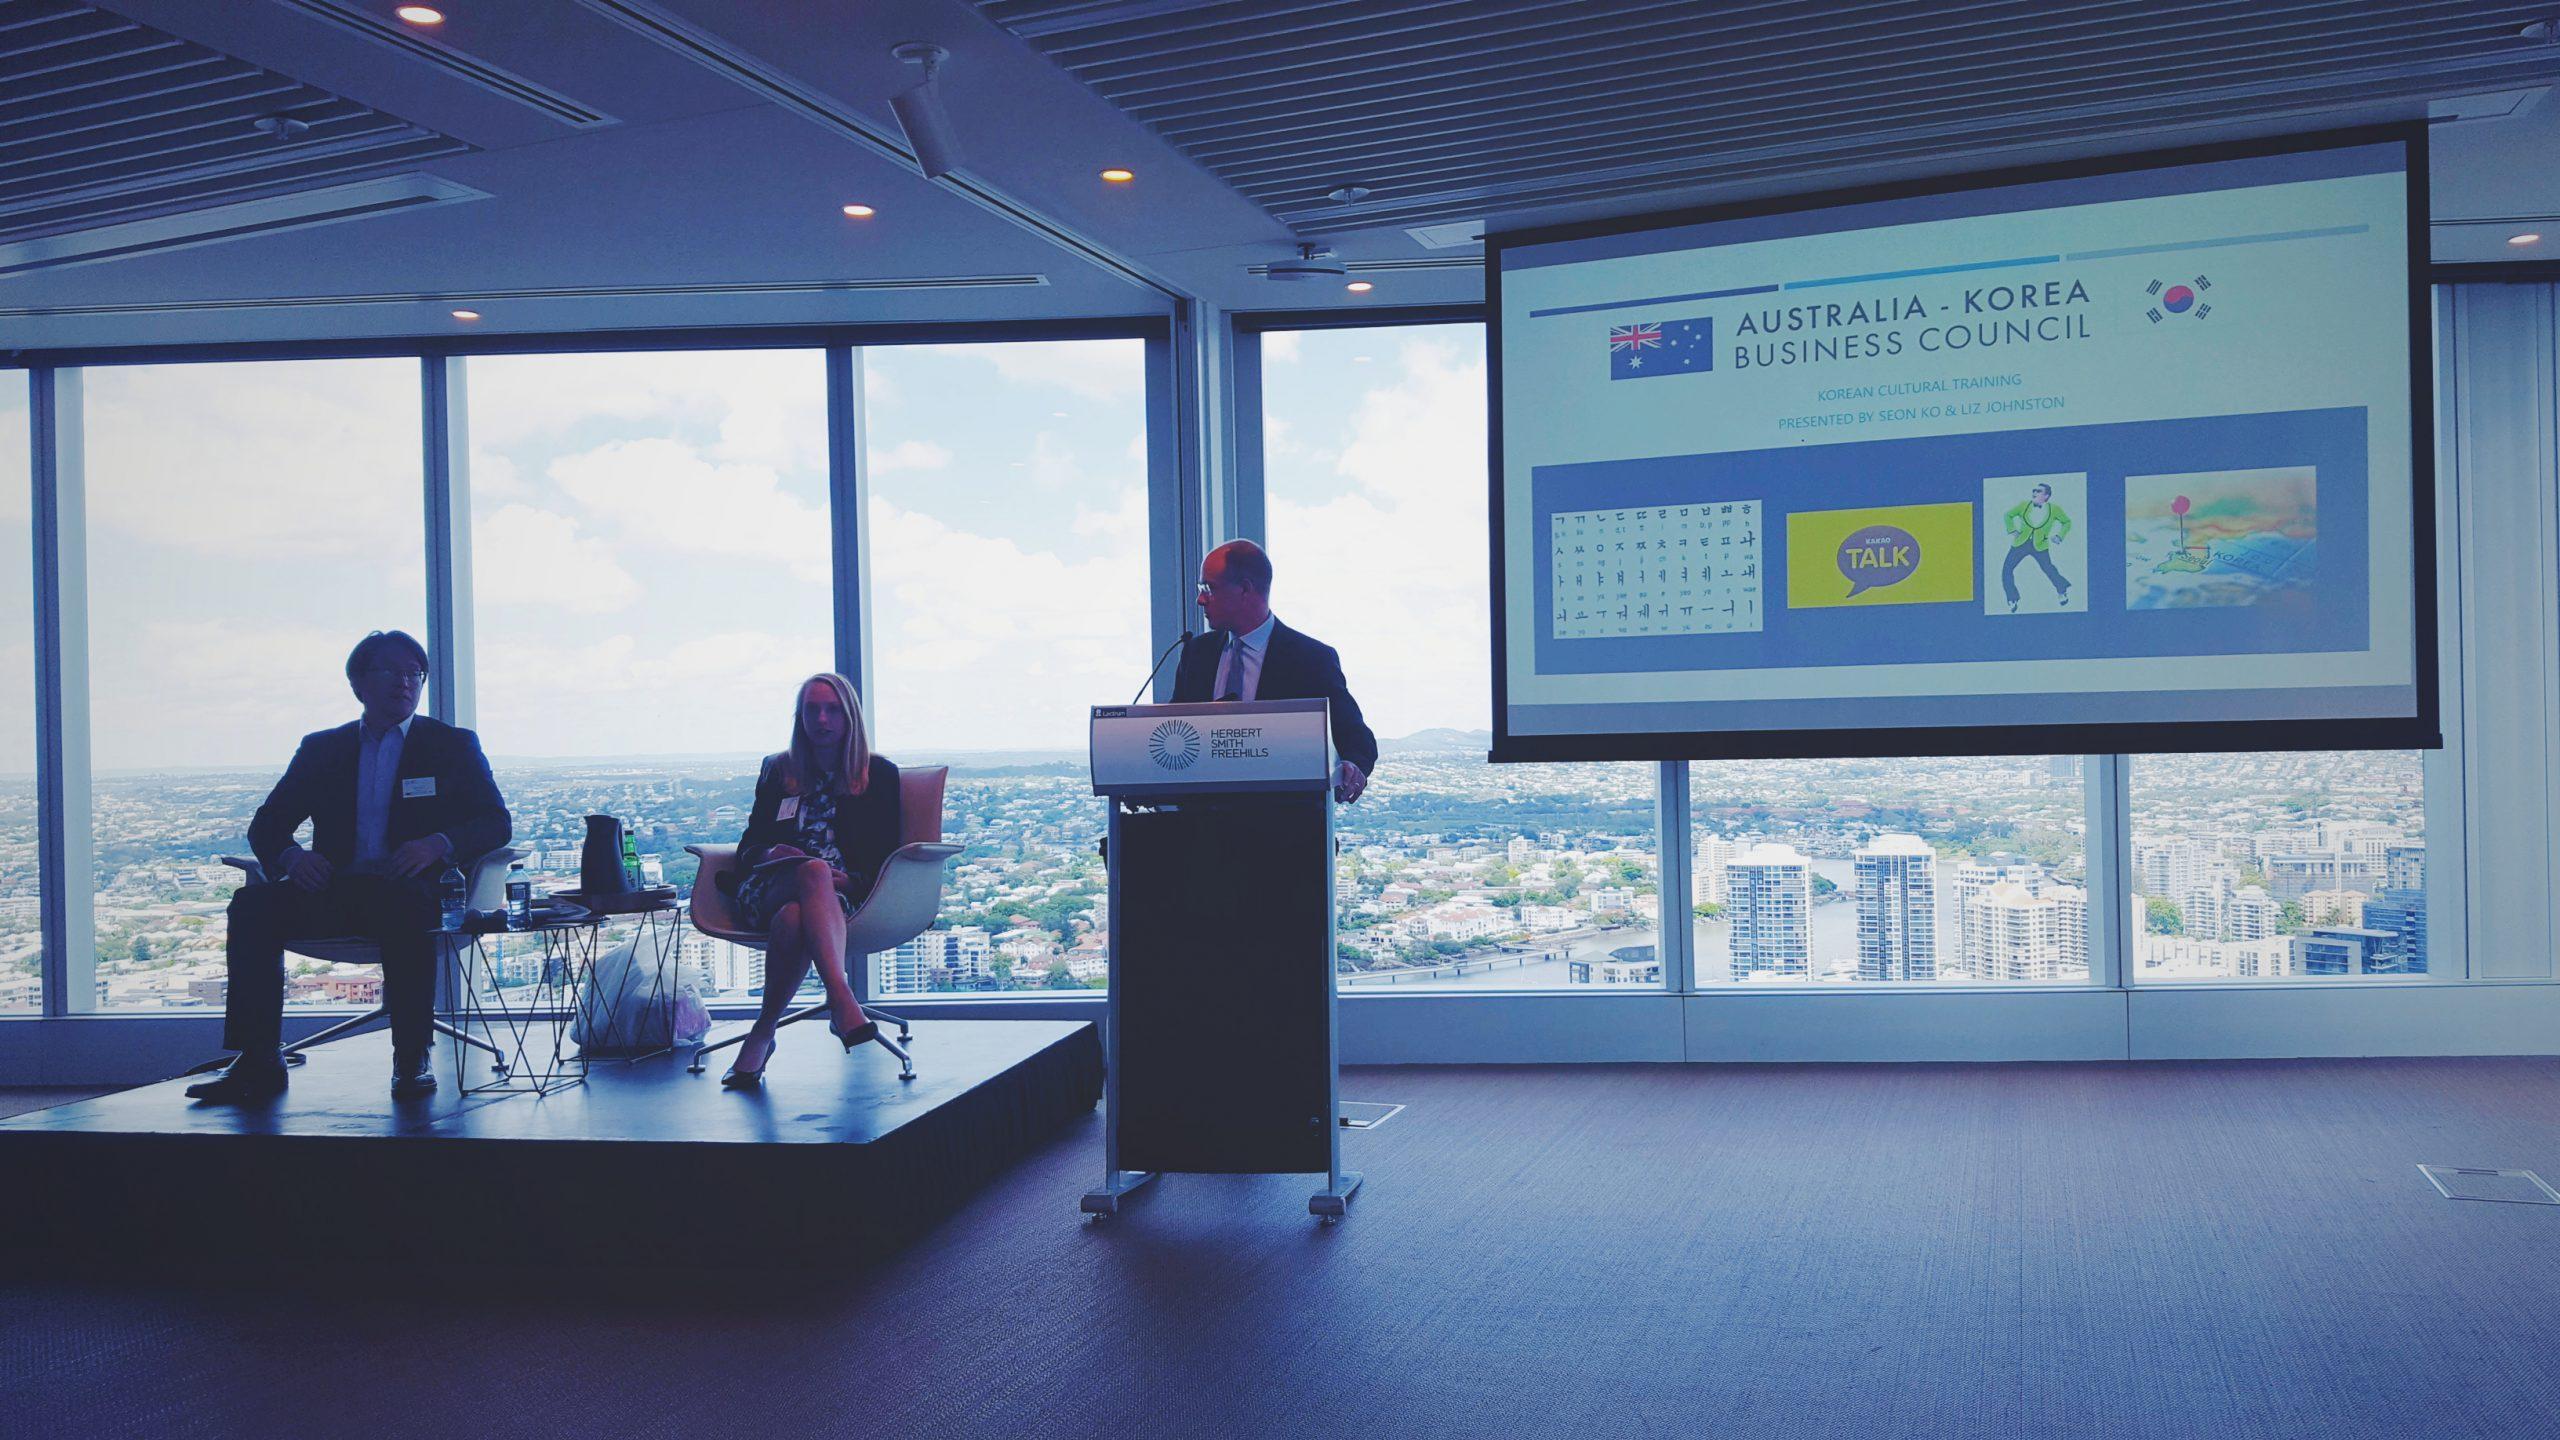 Event Recap: 38th Australia-Korea Business Council Joint Meeting